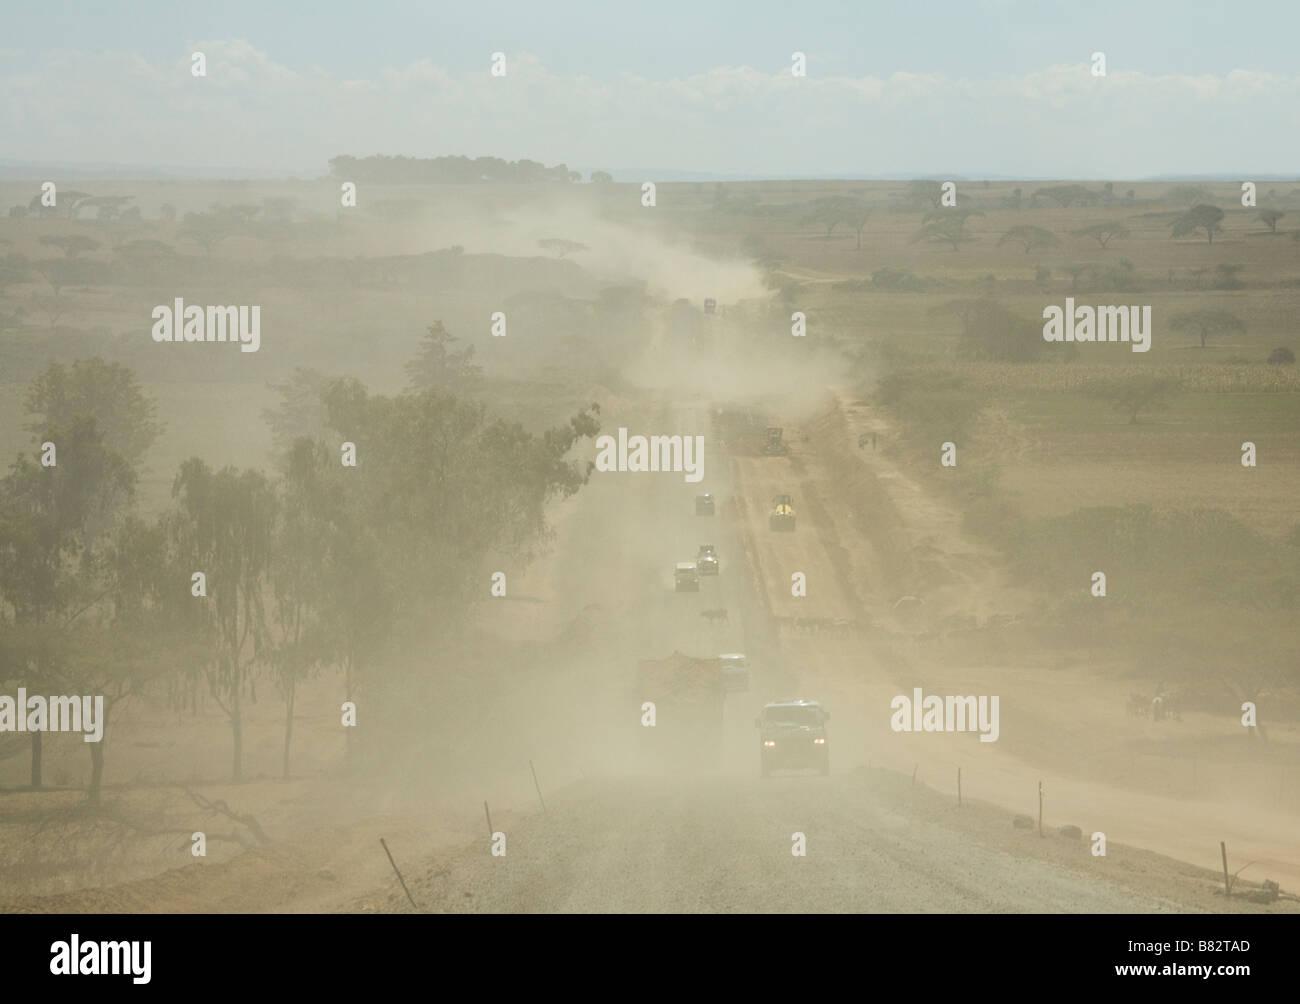 Road construction work on the B3 main road to Nairobi from the Masai Mara - Stock Image